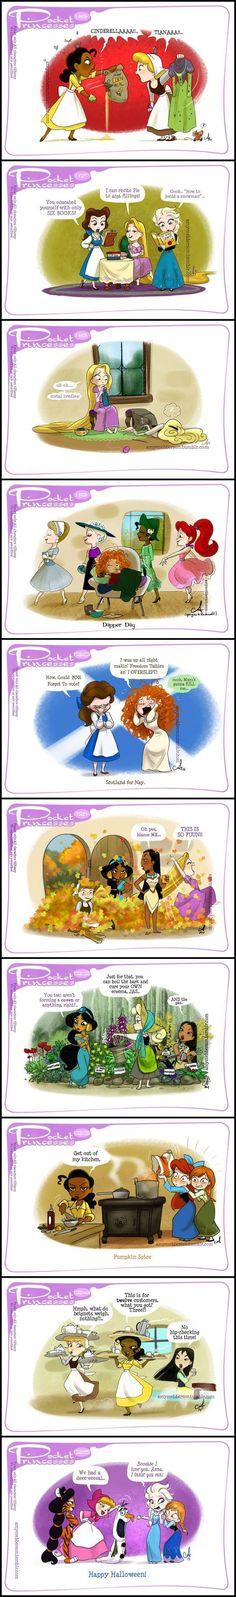 Pocket Princesses (Part 12) by Amy Mebberson: